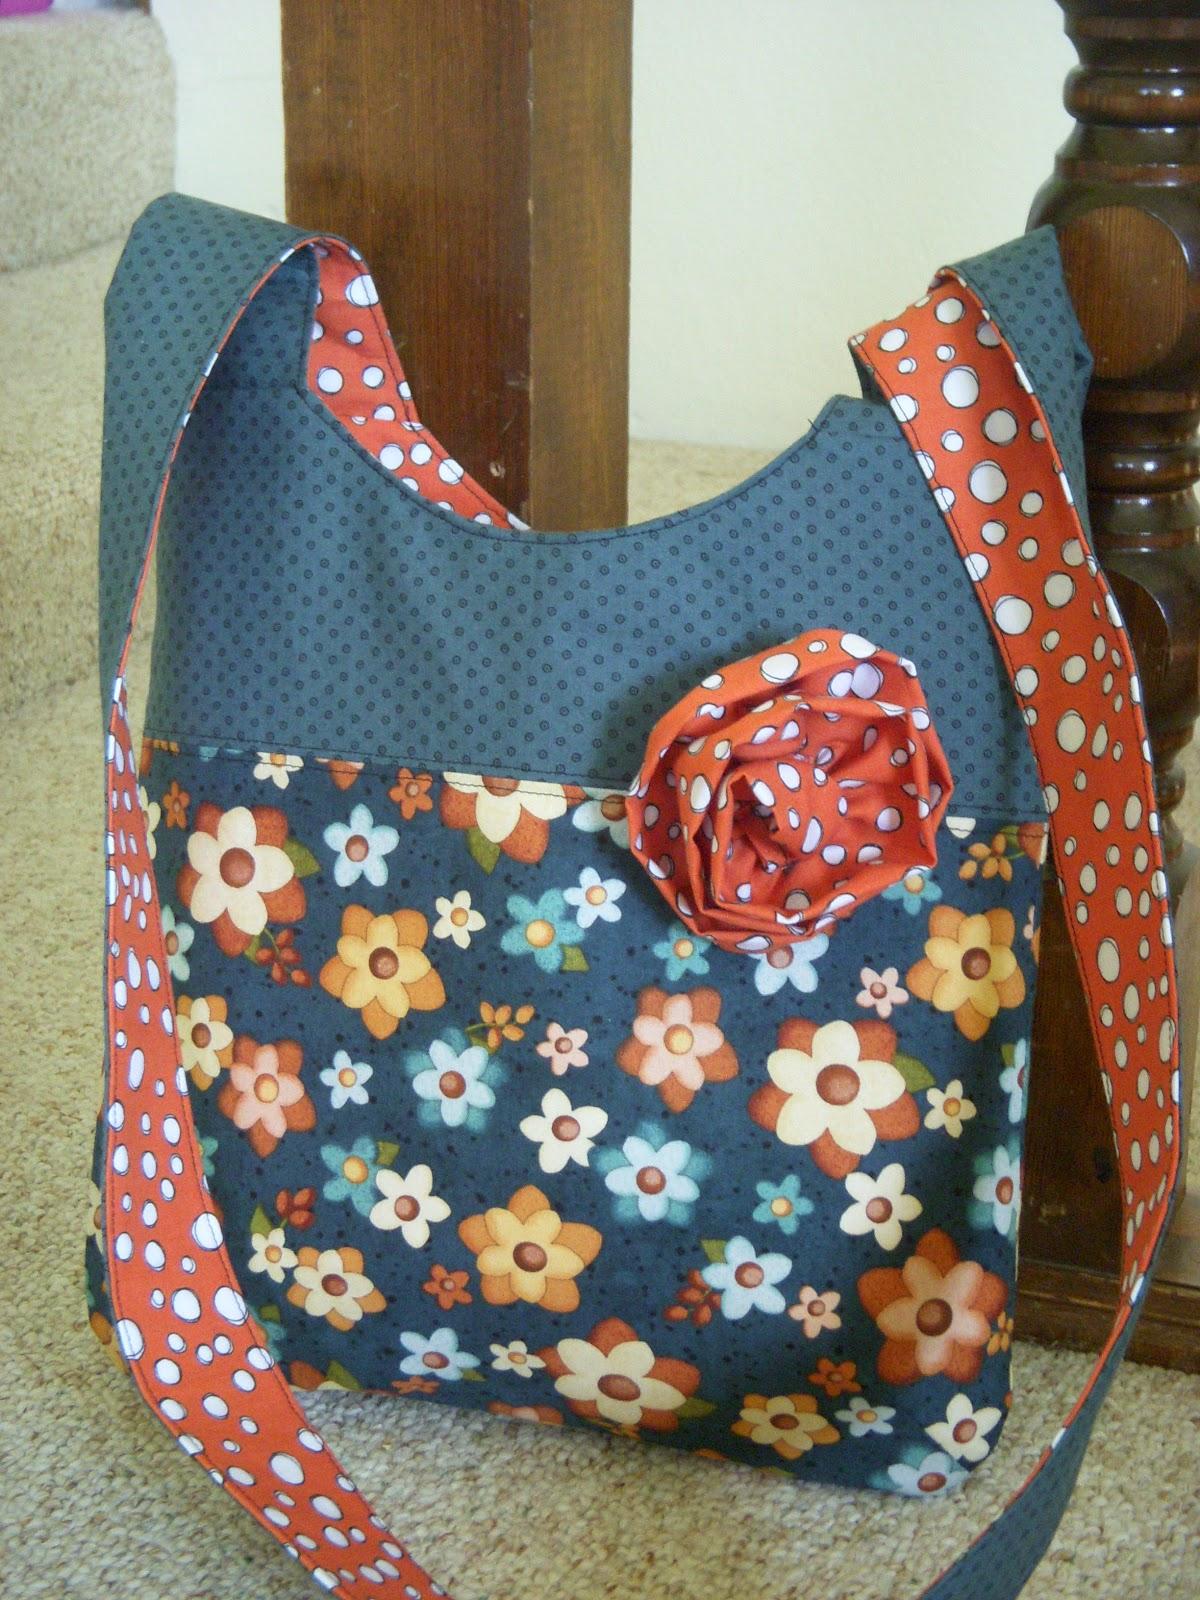 Sling Bag Pattern Free Download : Sling Bag Pattern For a sling bag pattern